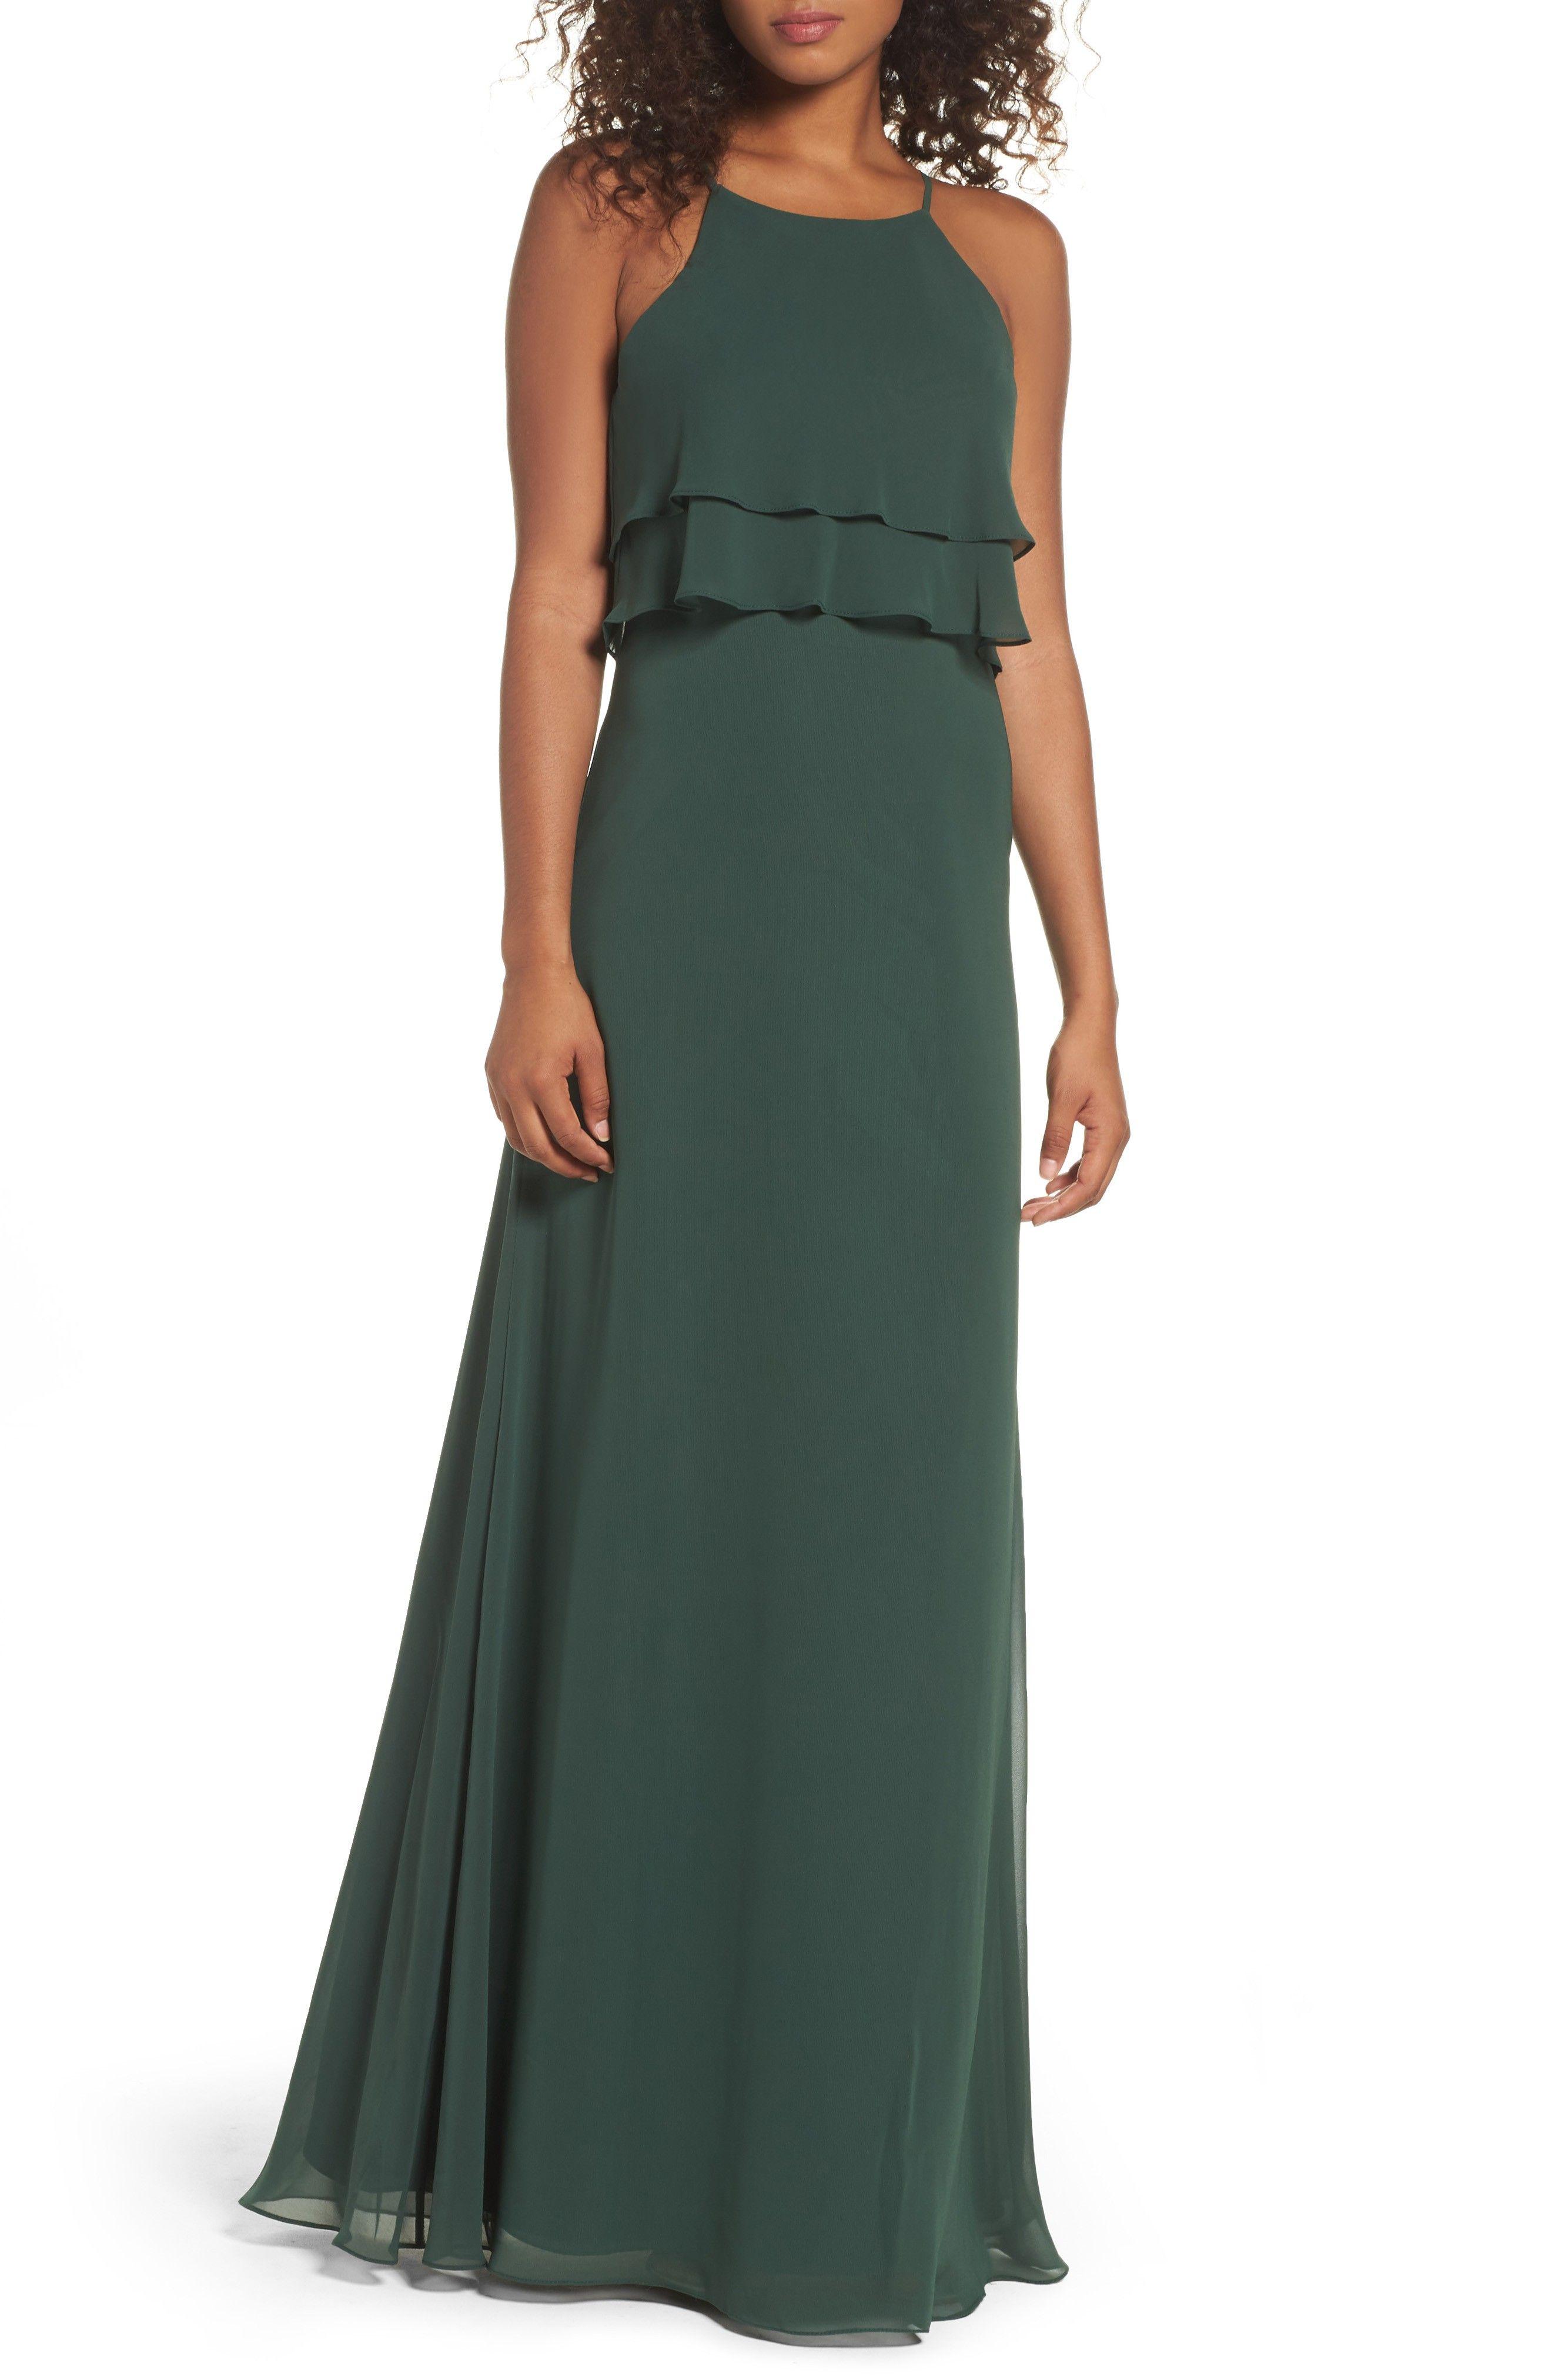 Green bridesmaids dress  Green Bridesmaid Dresses  Green colors Emeralds and Shorts